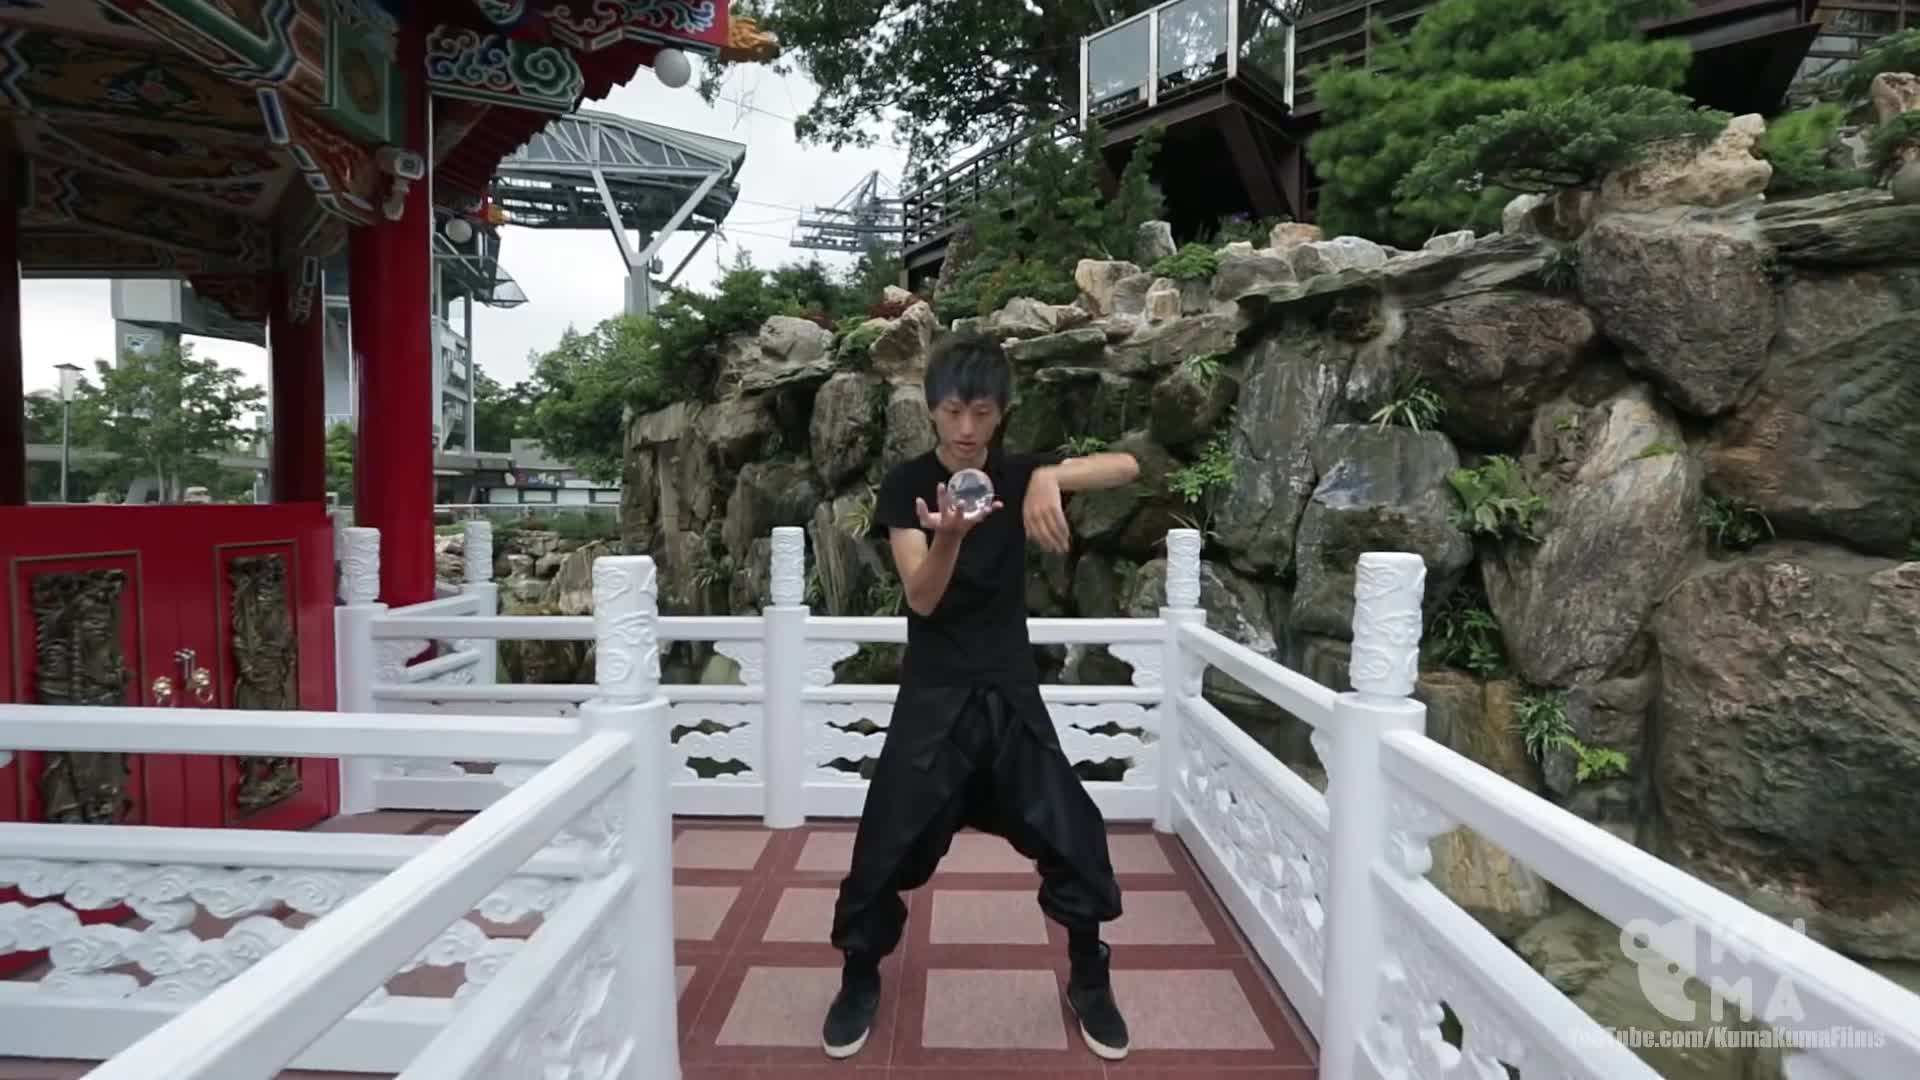 Contact Juggling, Juggling (Hobby), art of ninja, contact, fushigi, hypnotizing, illusion, magic, street performer, taipei, Contact Juggling GIFs